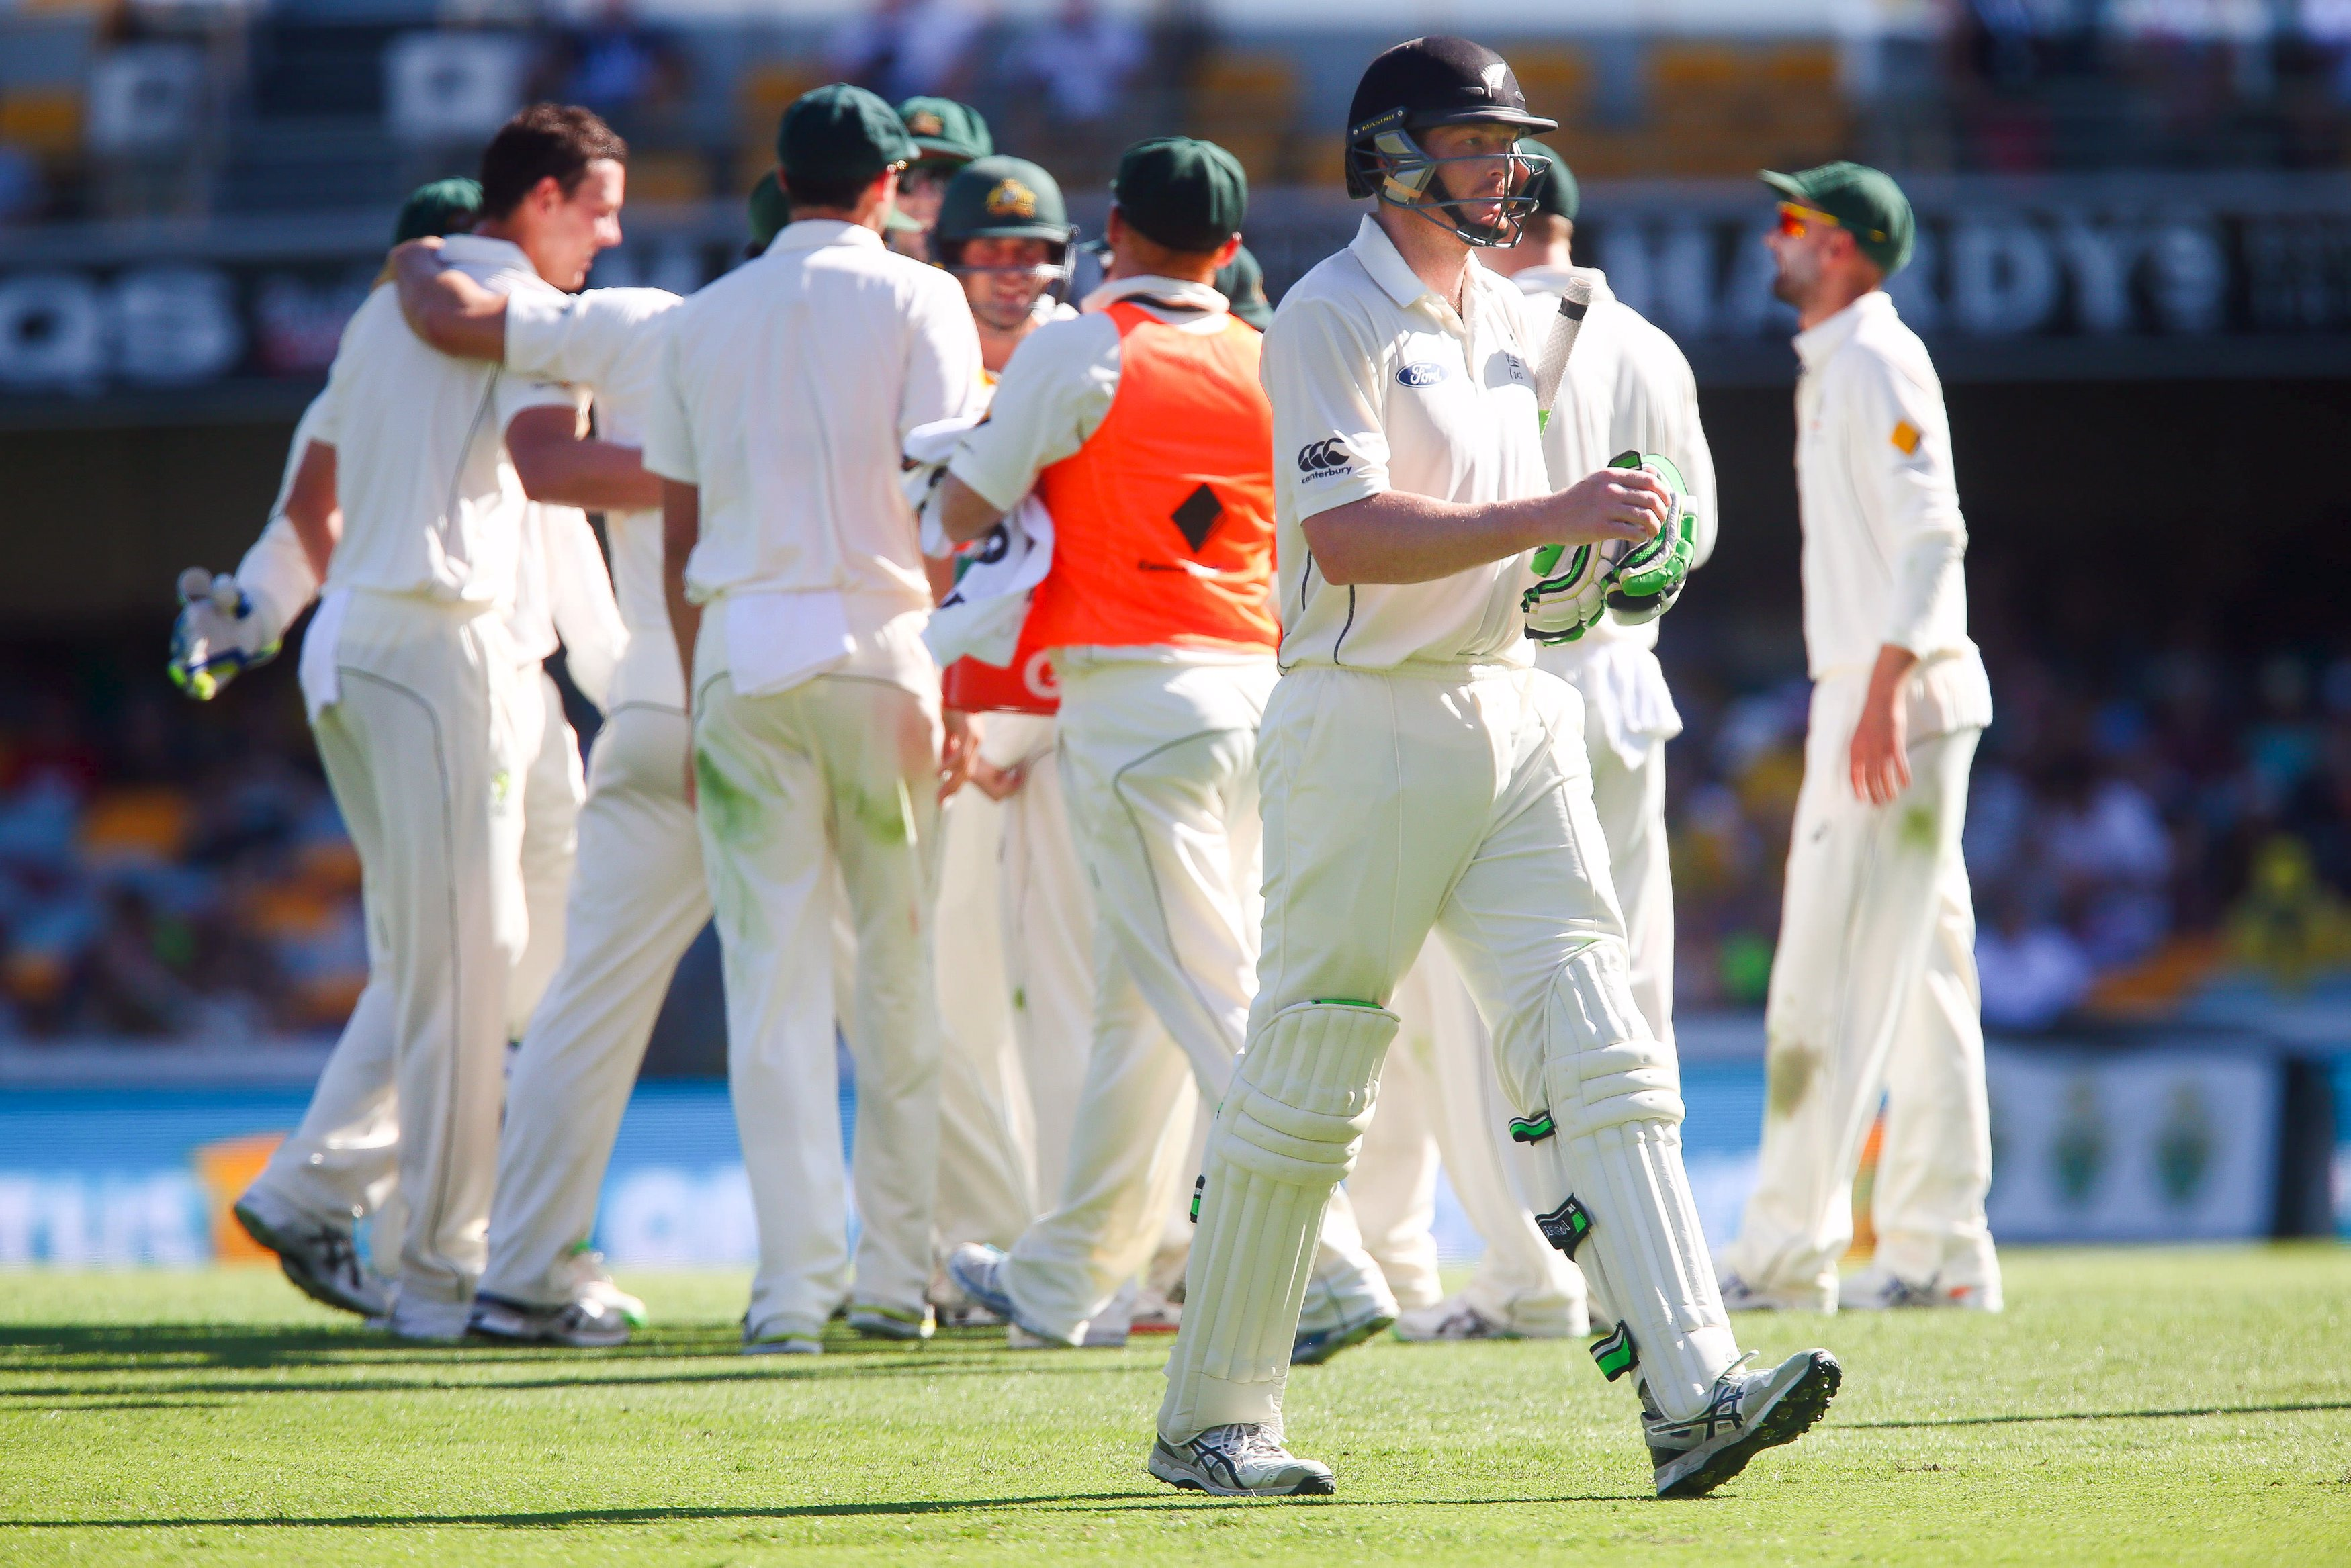 New Zealand batsman Martin Guptill departs after being dismissed by Australian bowler Josh Hazlewood during the first cricket test match between Australia and New Zealand in Brisbane November 6, 2015. REUTERS/Patrick Hamilton